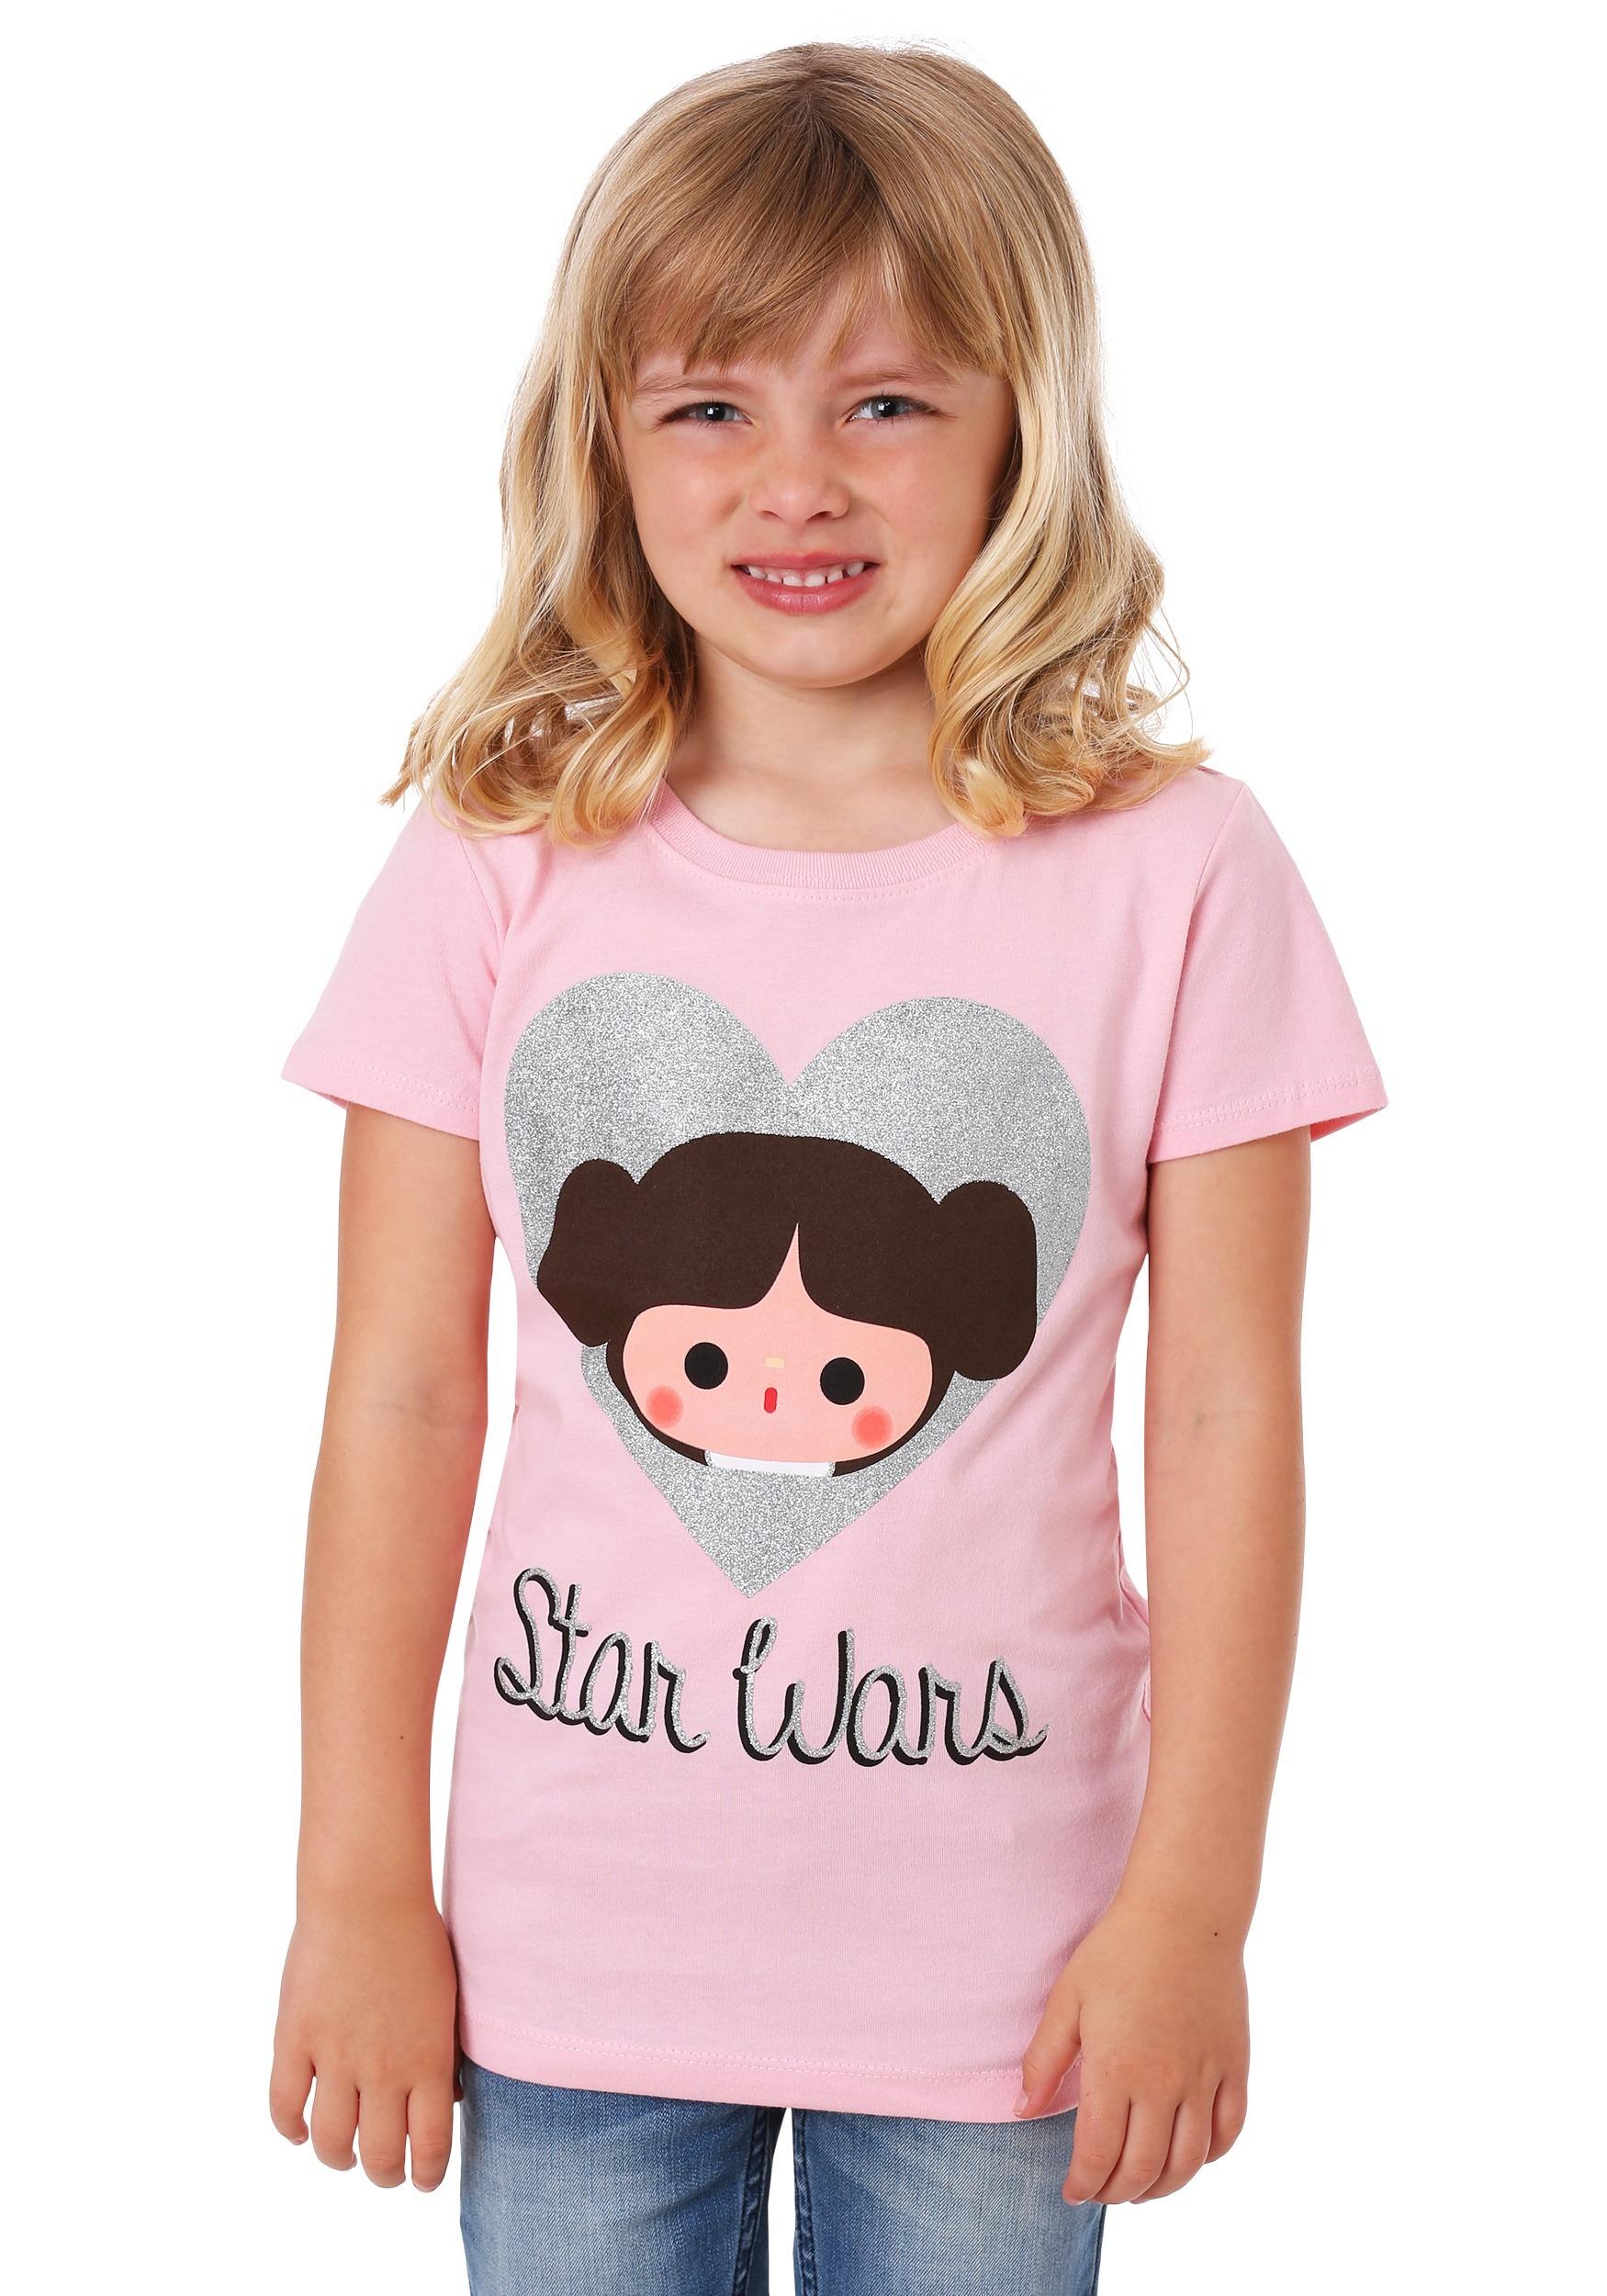 Star Wars Princess Leia Only HopeKids Toddler T-Shirt